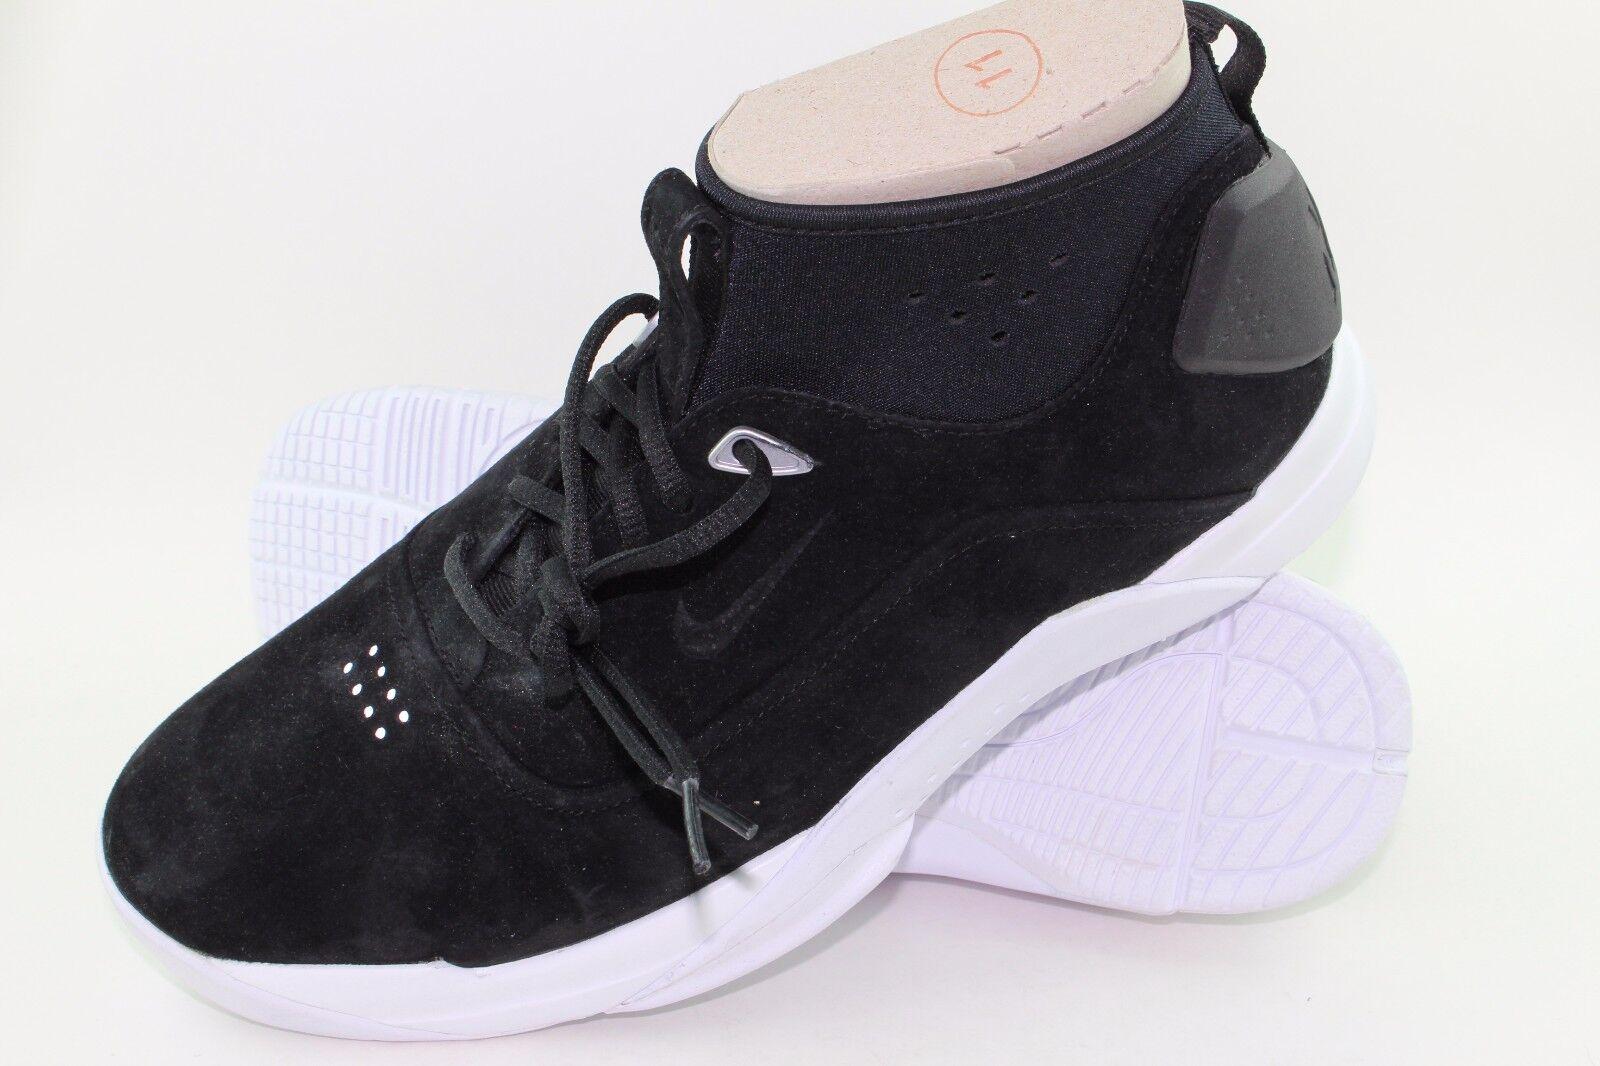 Nike Hyperdunk Low Lux Black Men Size 11.5 New Rare Authentic Basketball